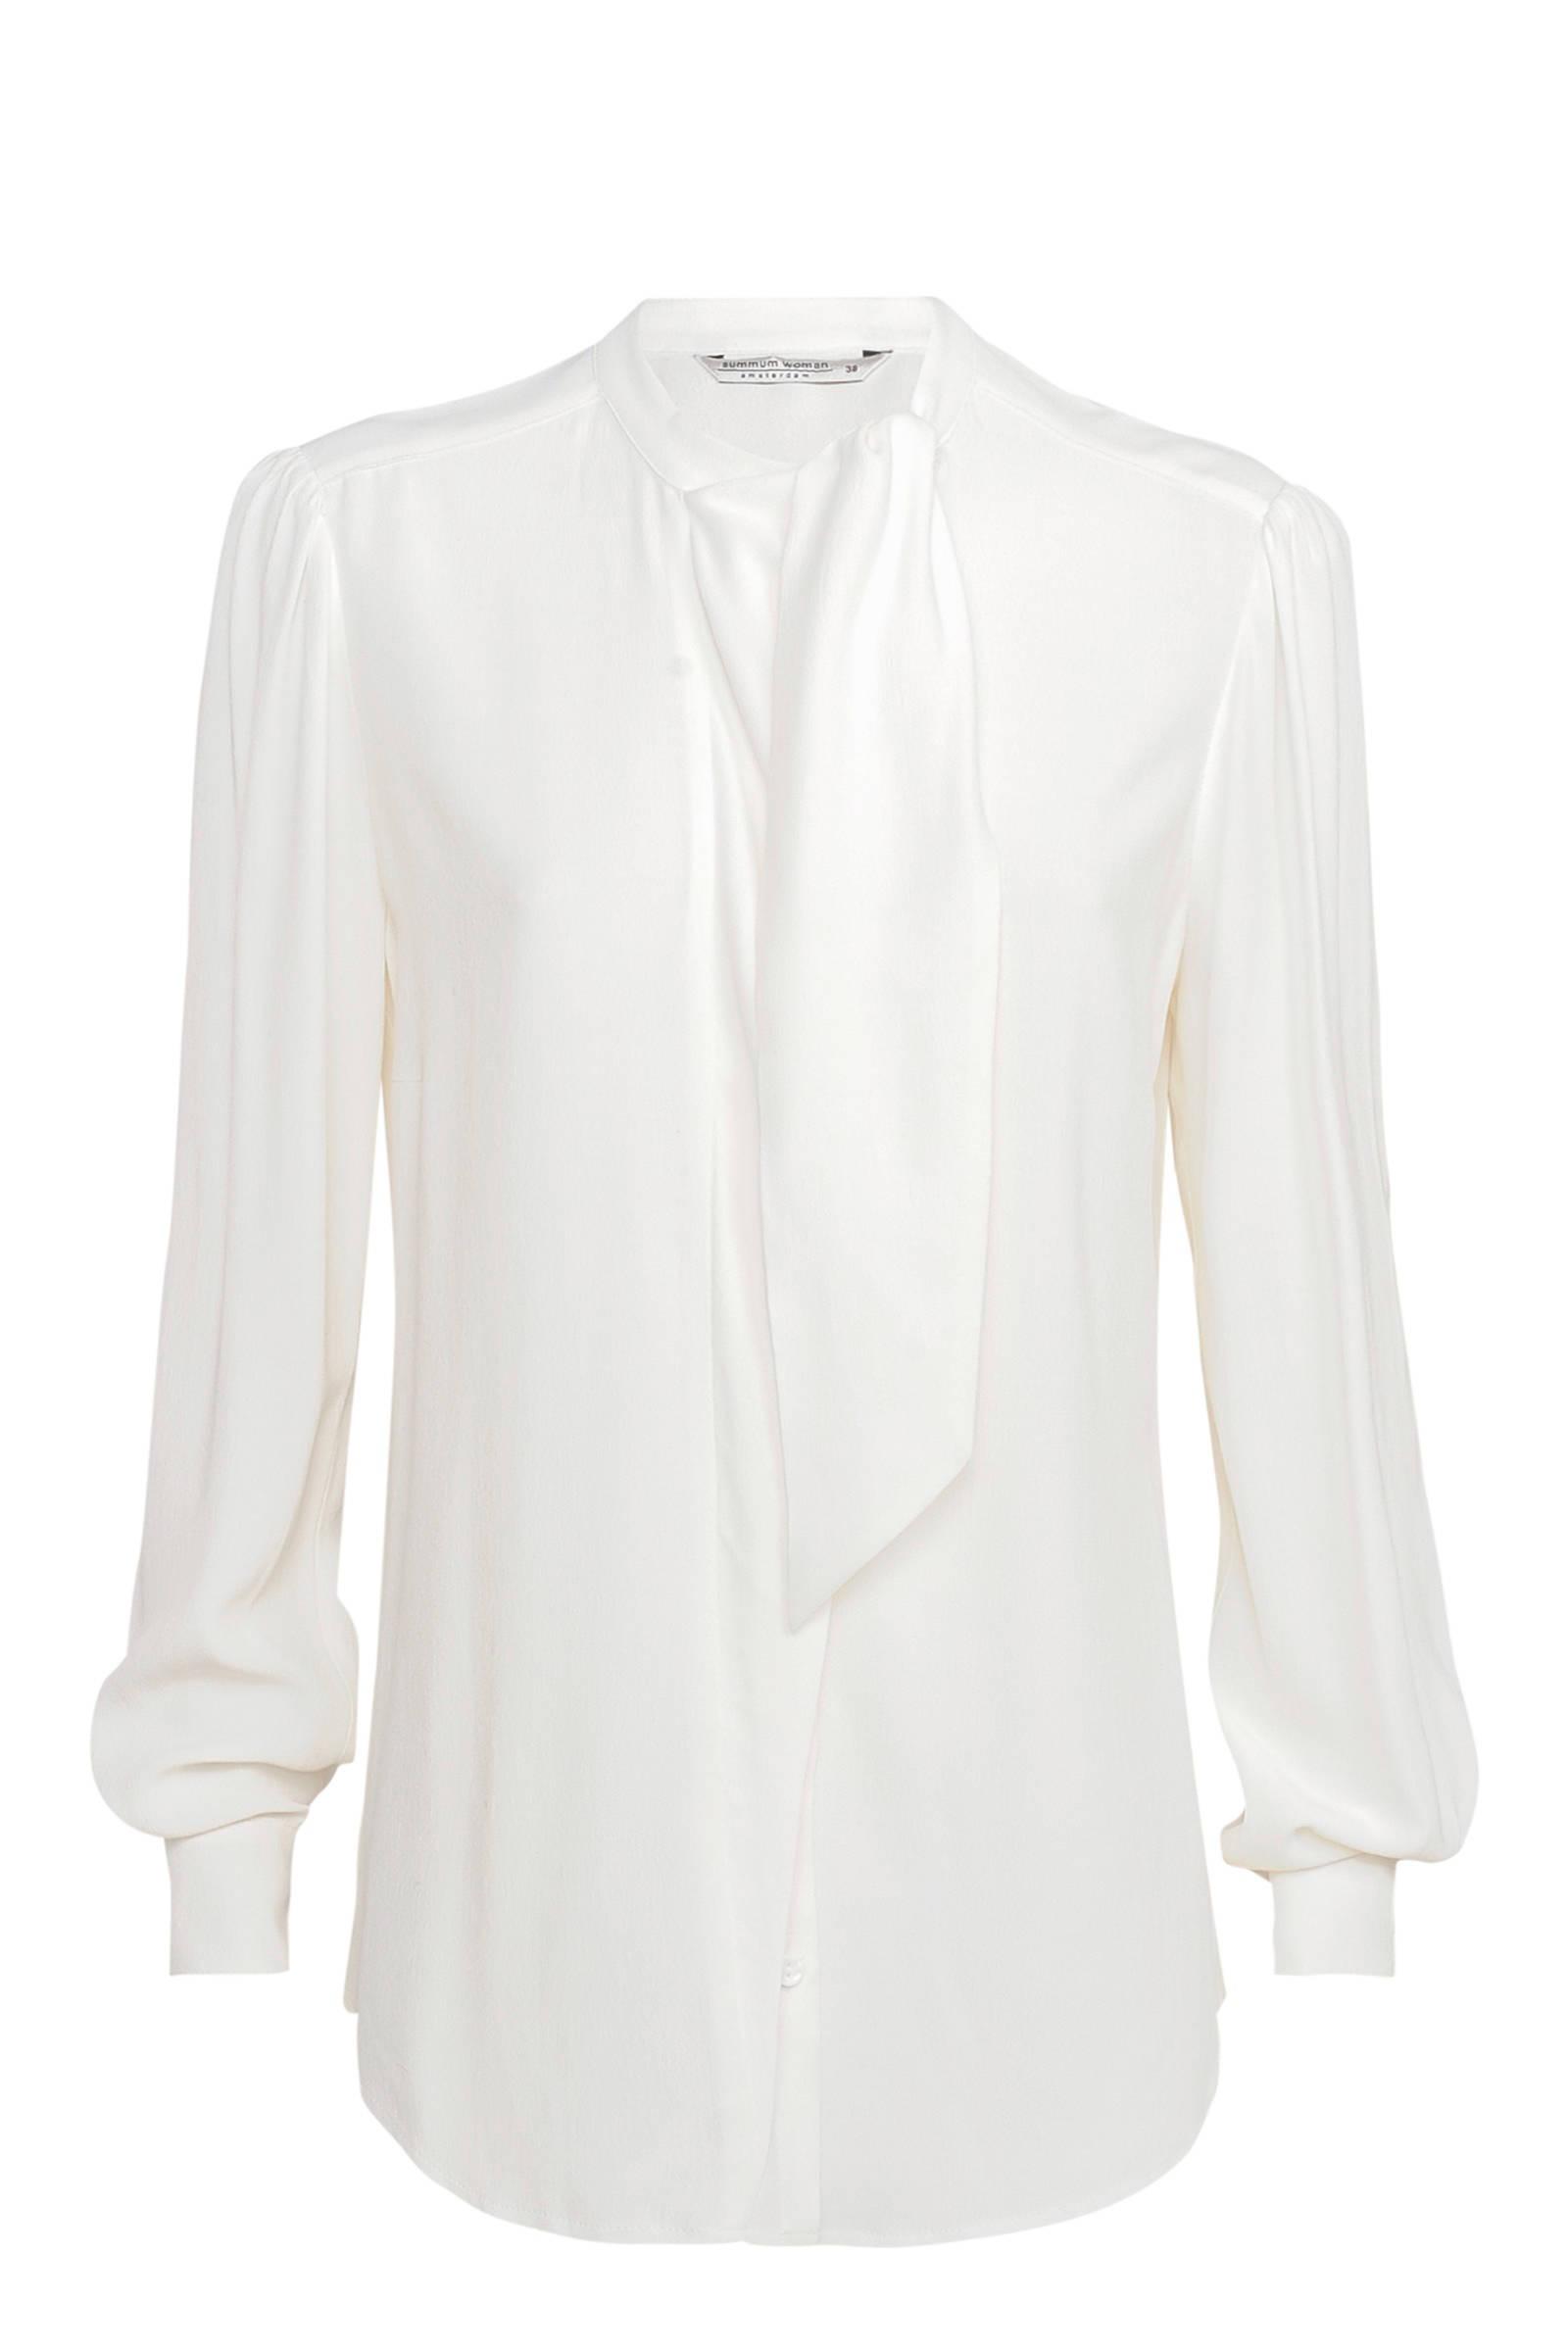 Witte dames blouse met lint Summum - 2S2280-10963